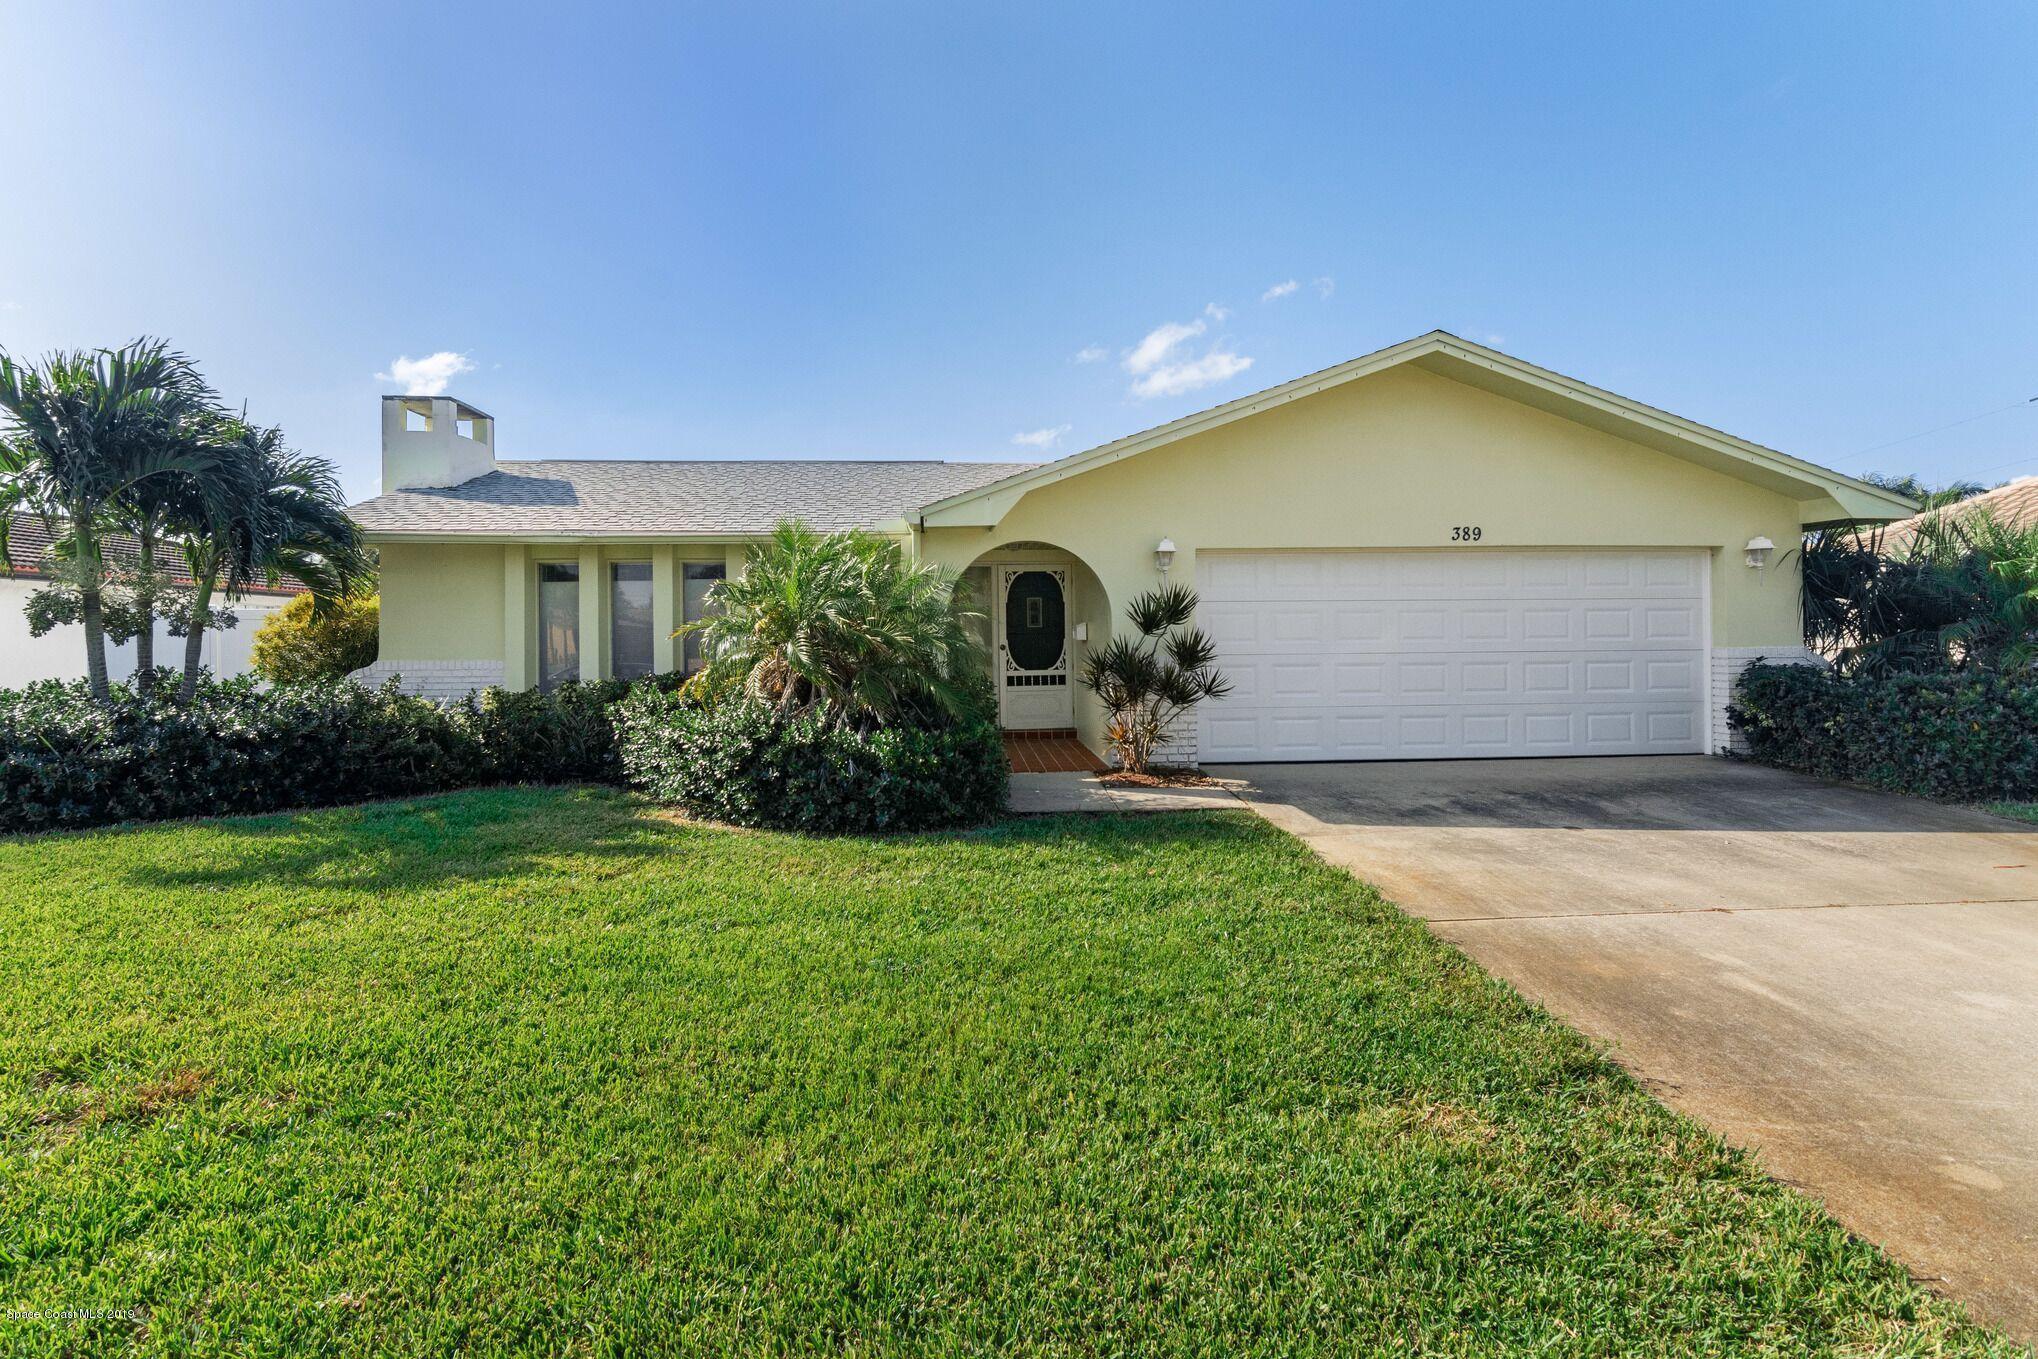 Single Family Homes for Sale at 389 Desoto Satellite Beach, Florida 32937 United States